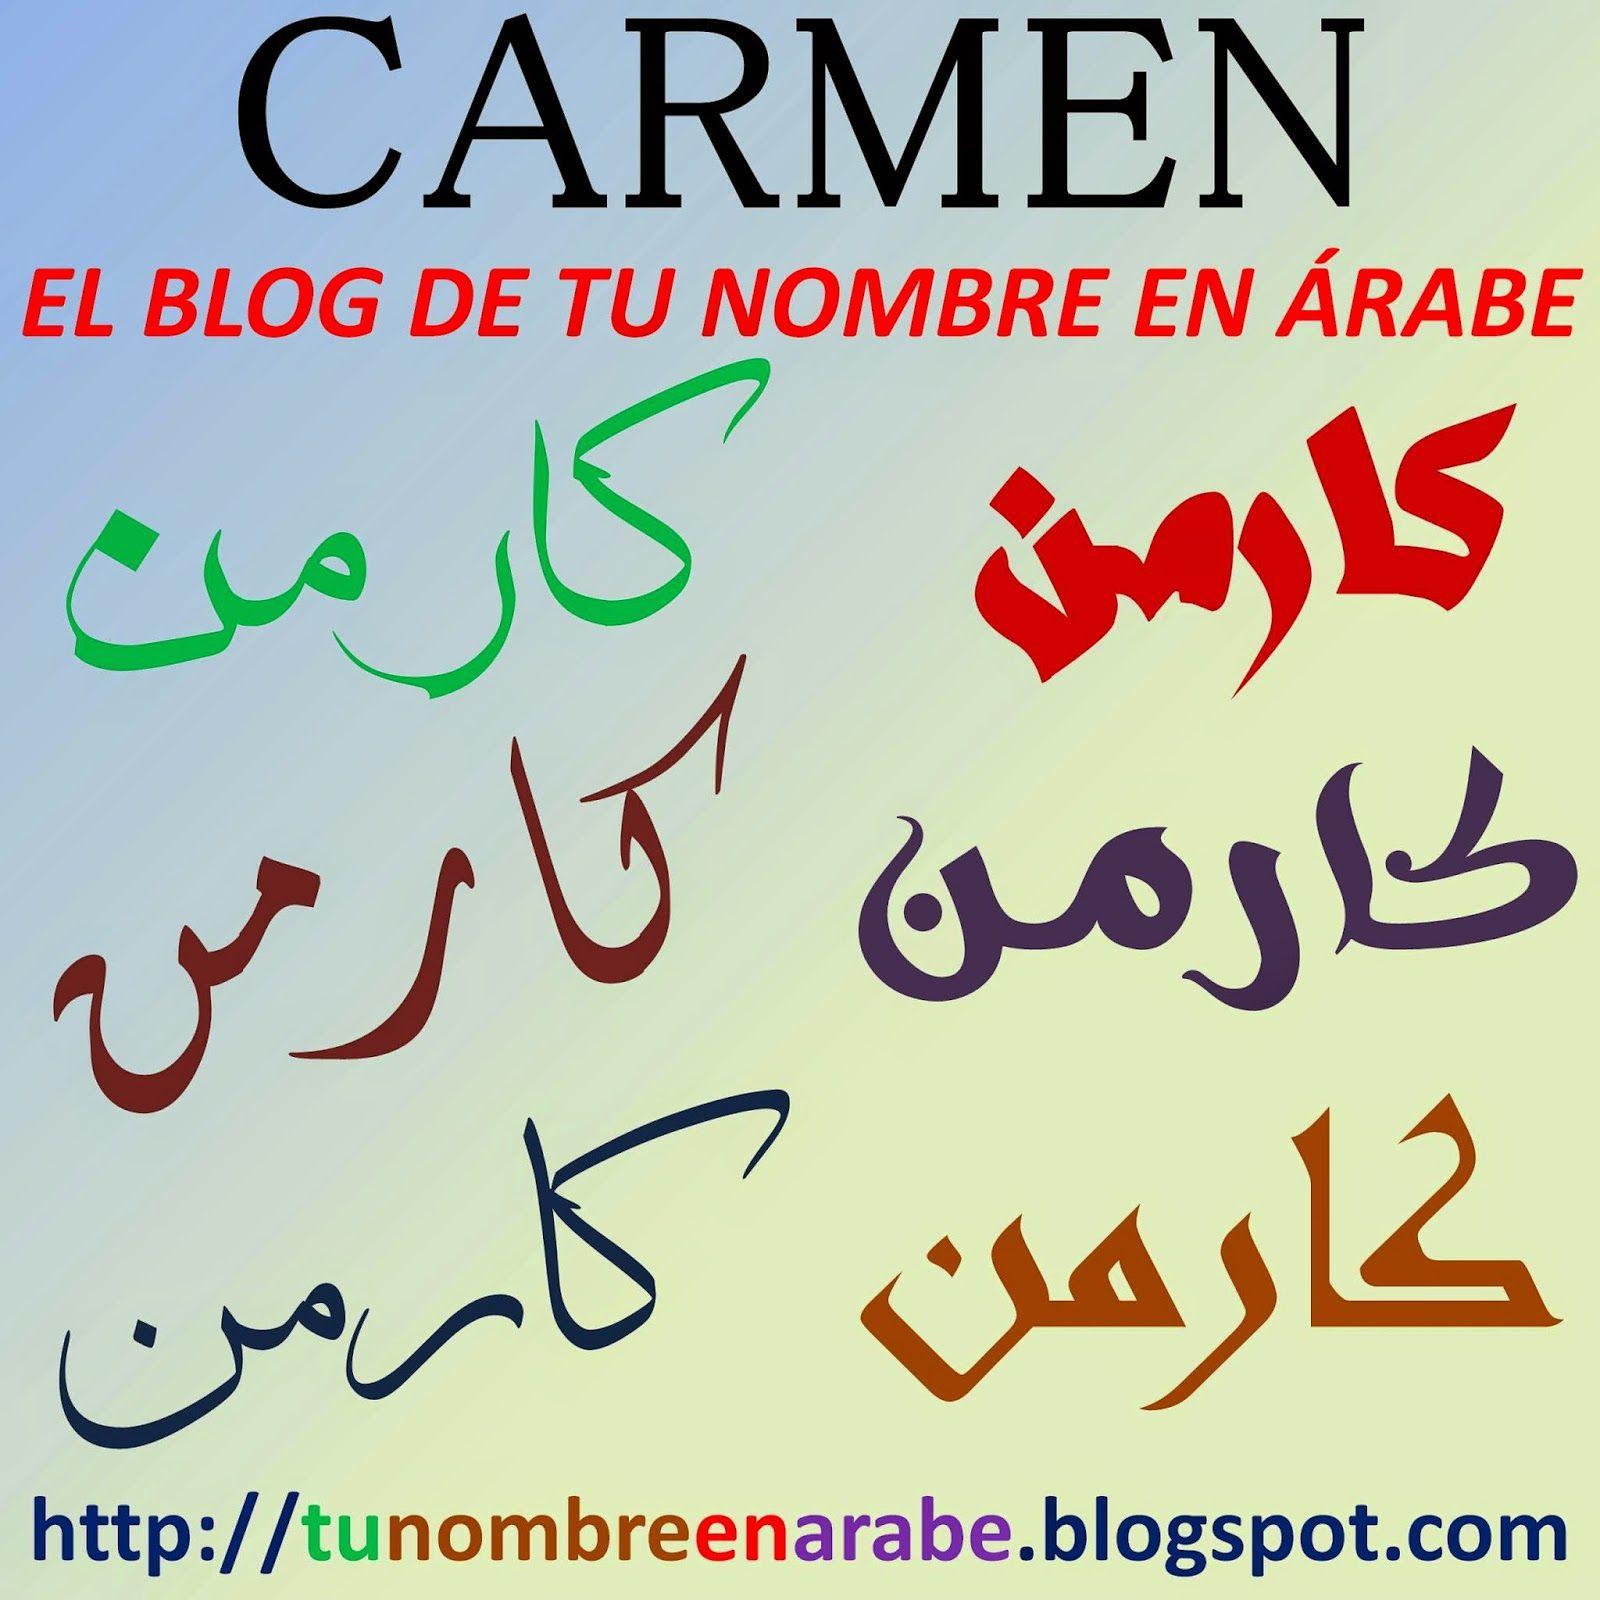 Imagenes De Tu Nombre En Arabe Nombres En Arabe Tatuajes De